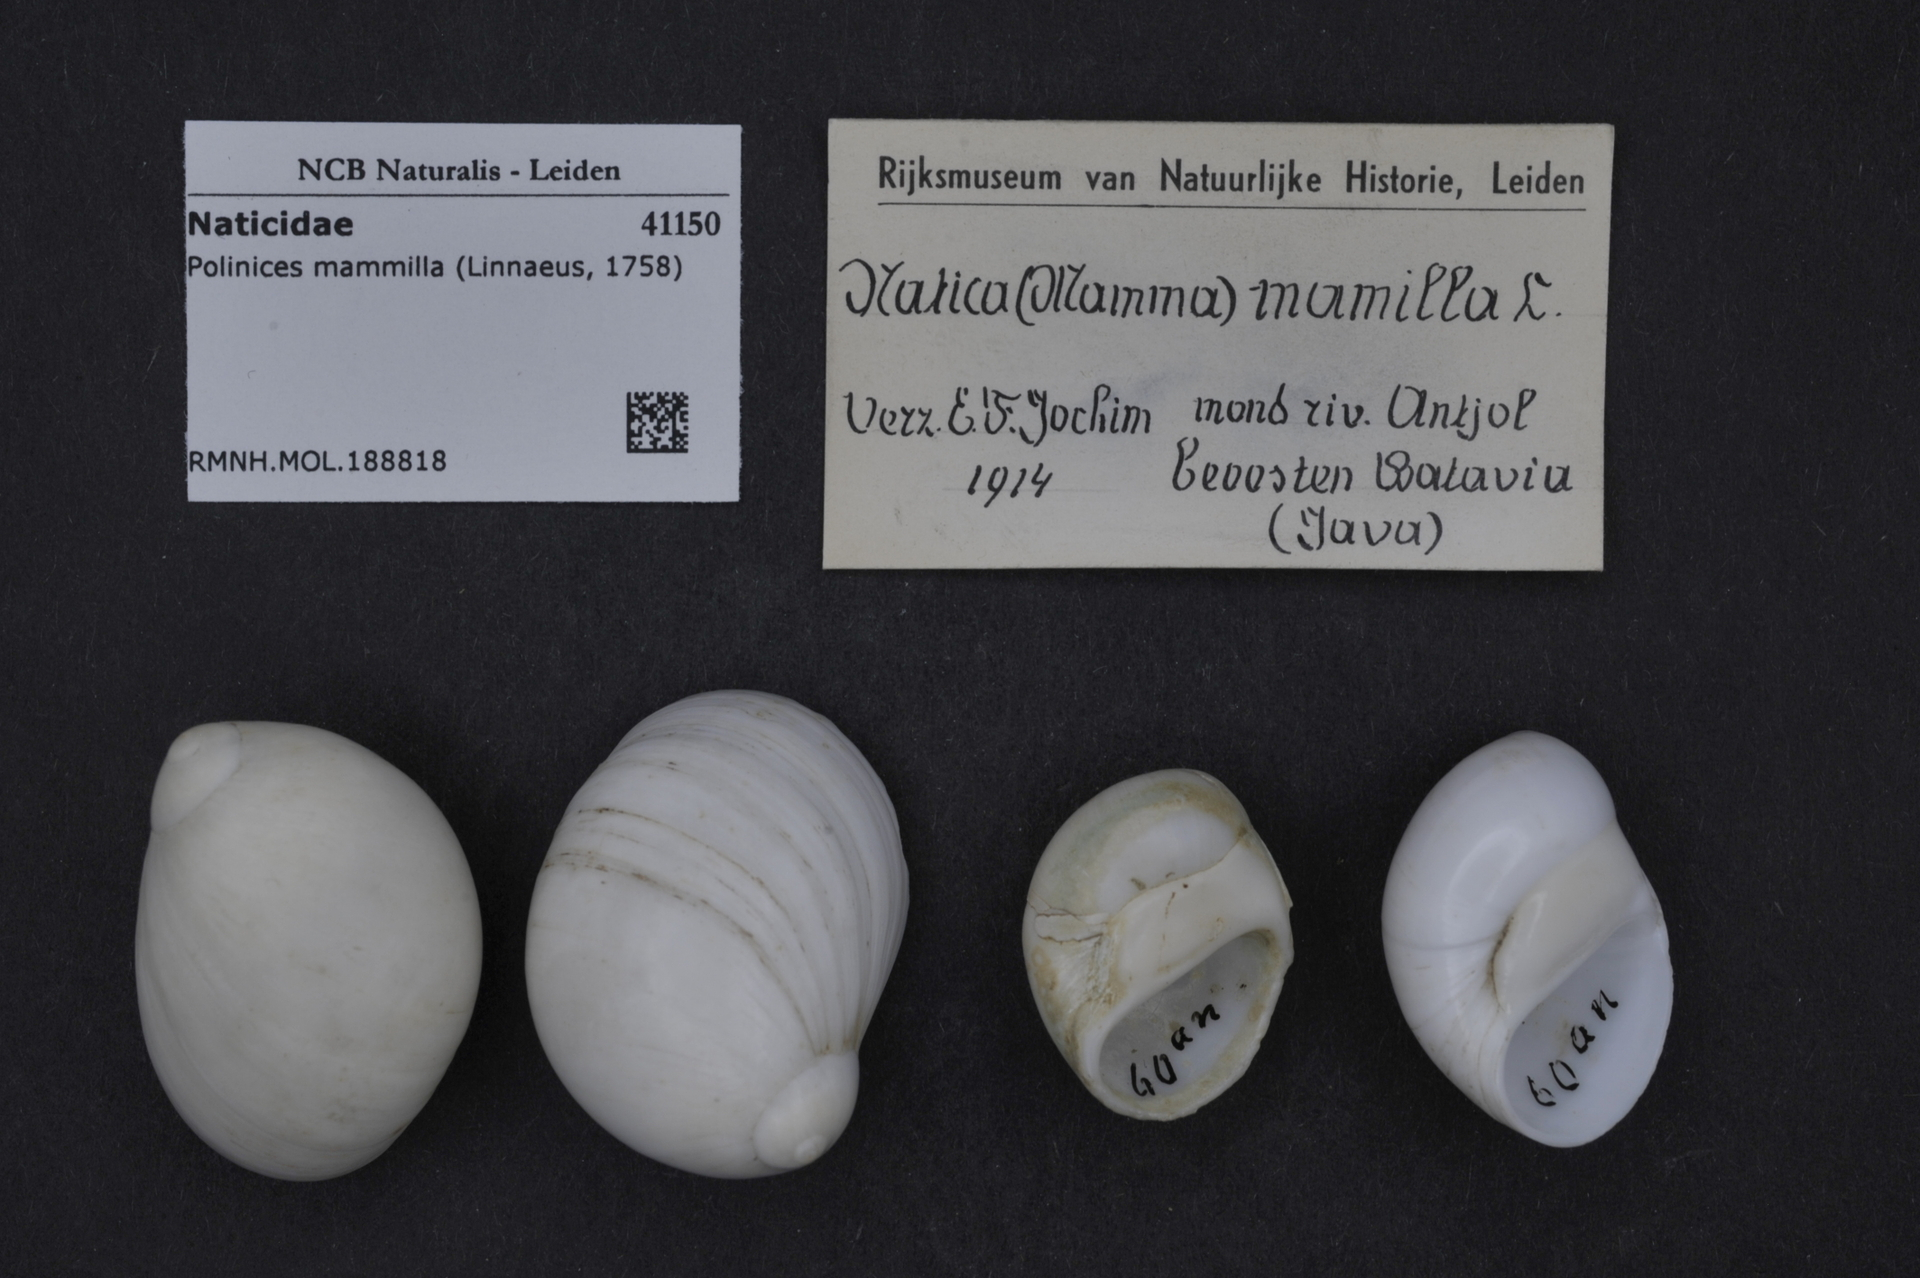 RMNH.MOL.188818 | Polinices mammilla (Linnaeus, 1758)